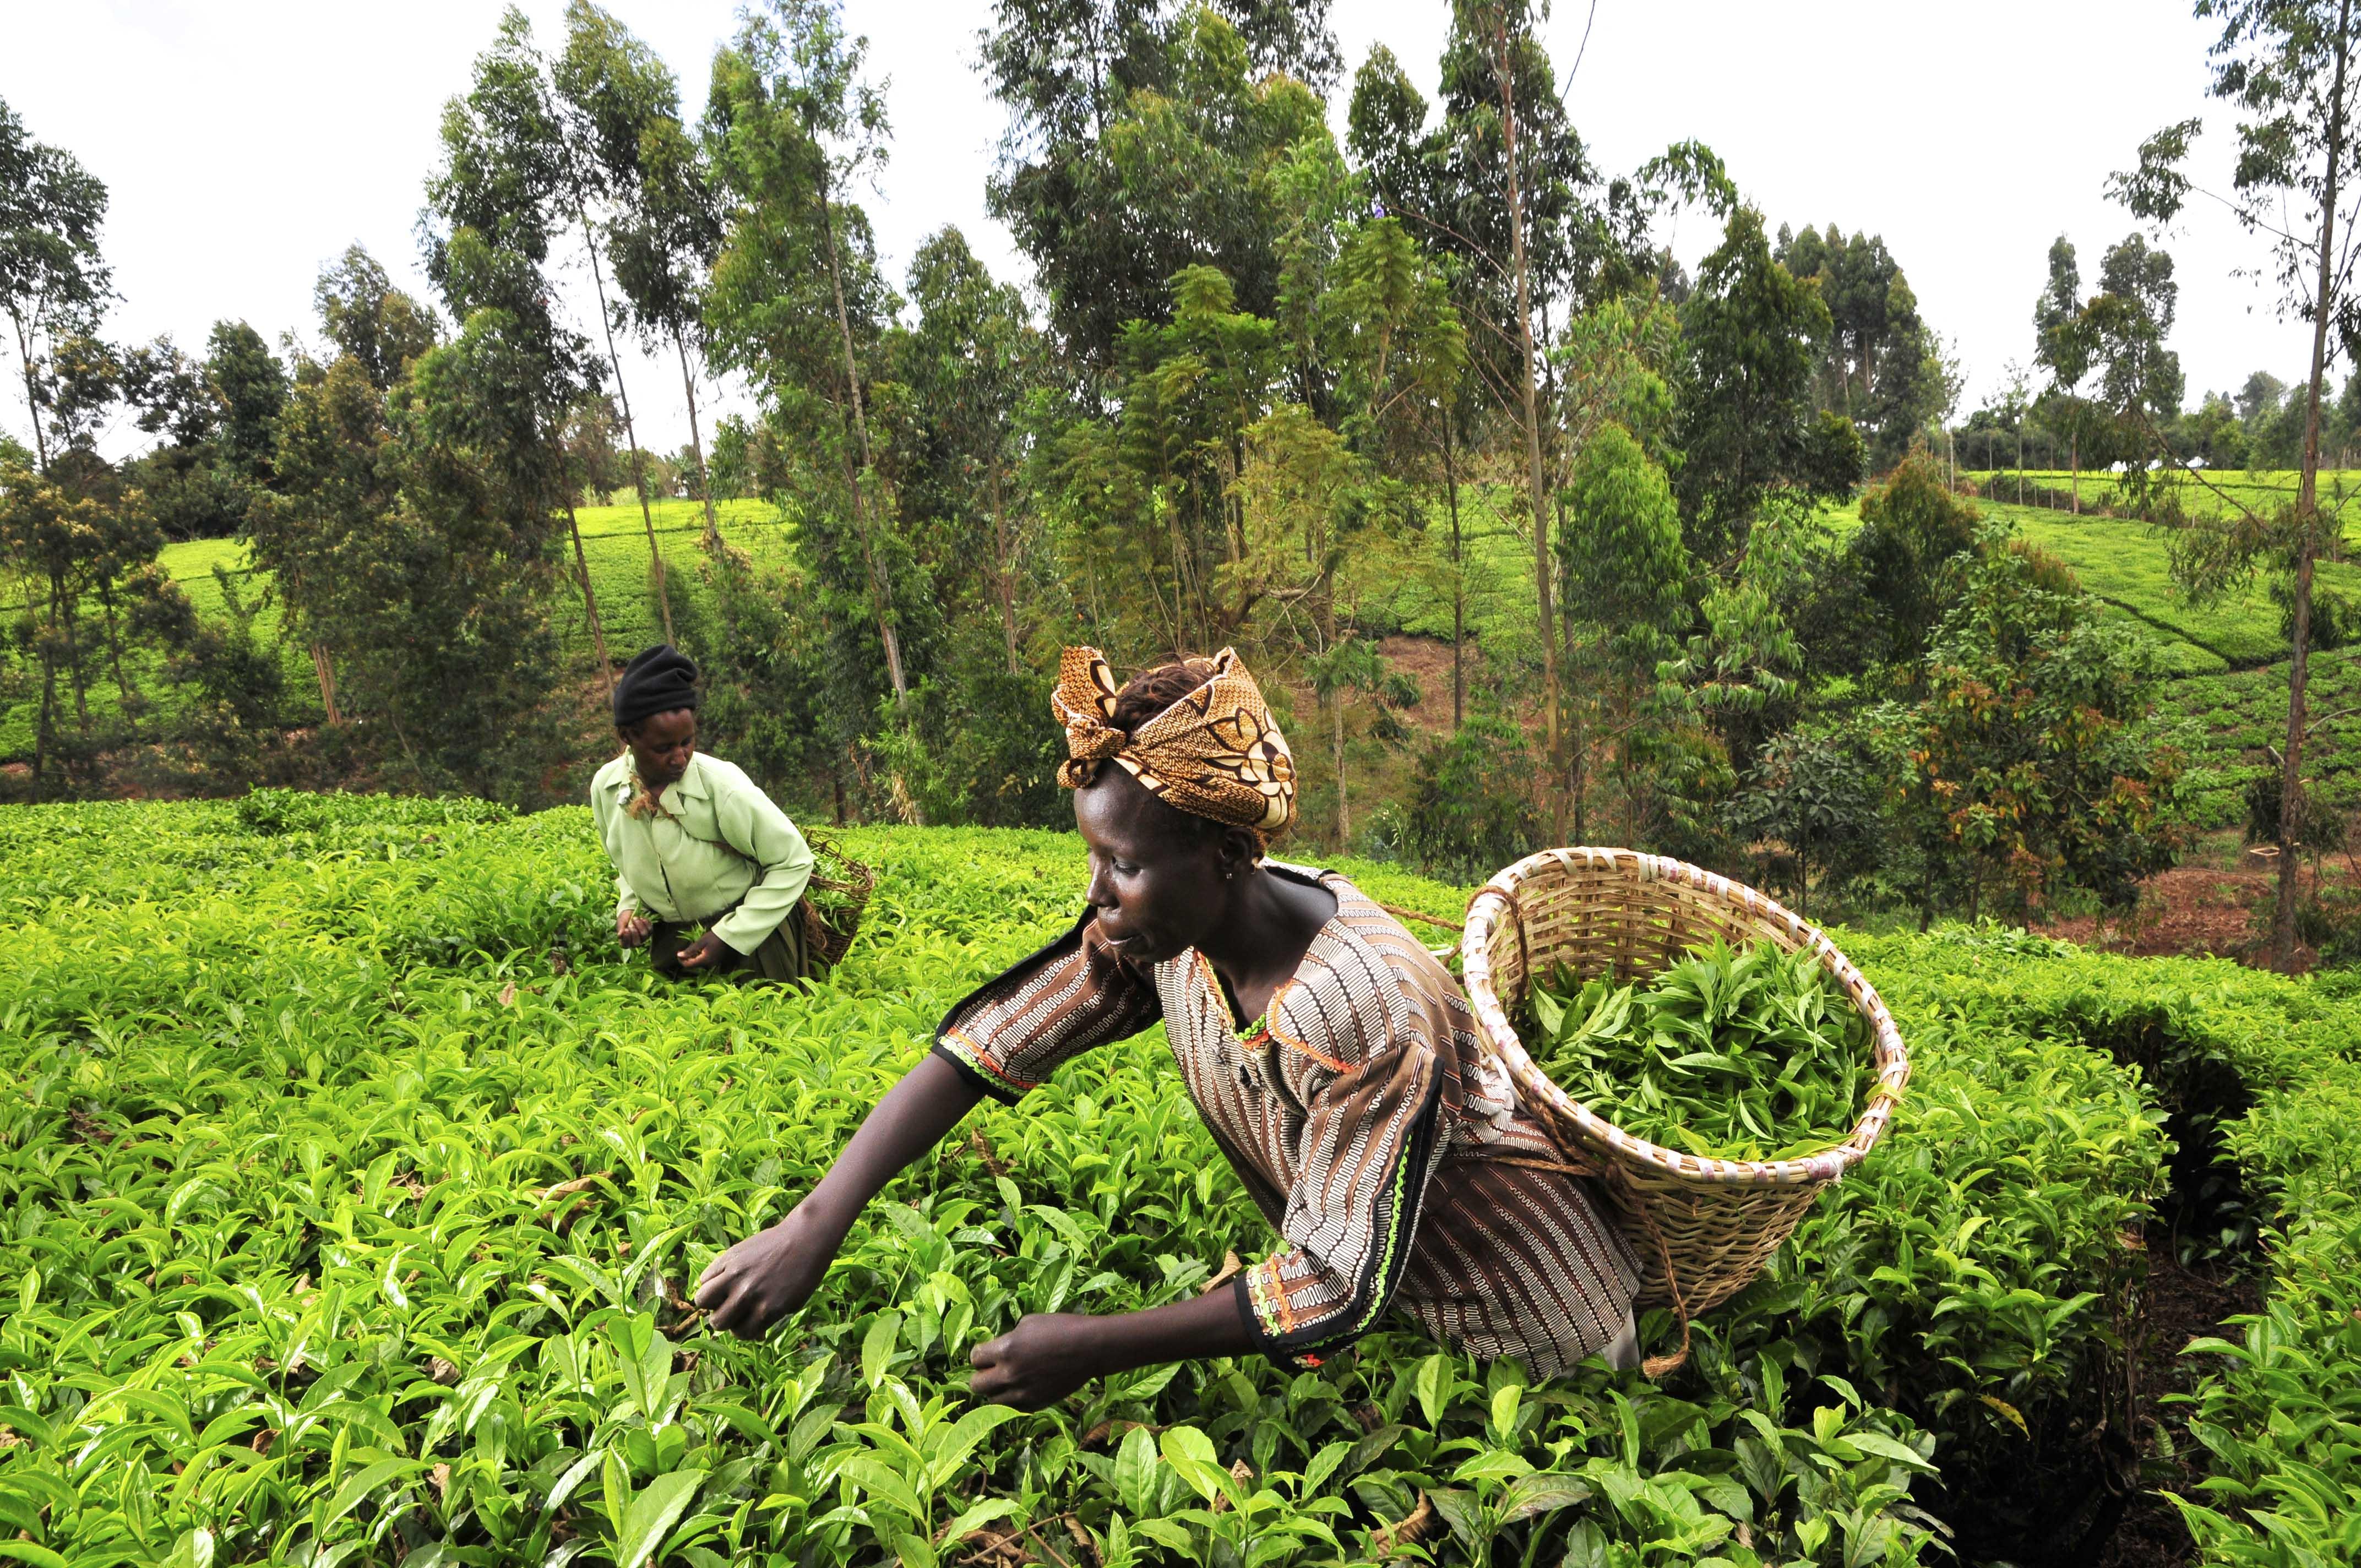 Ghanian former anti-GMO farm leader reverses stance, now backs biotechnology innovation